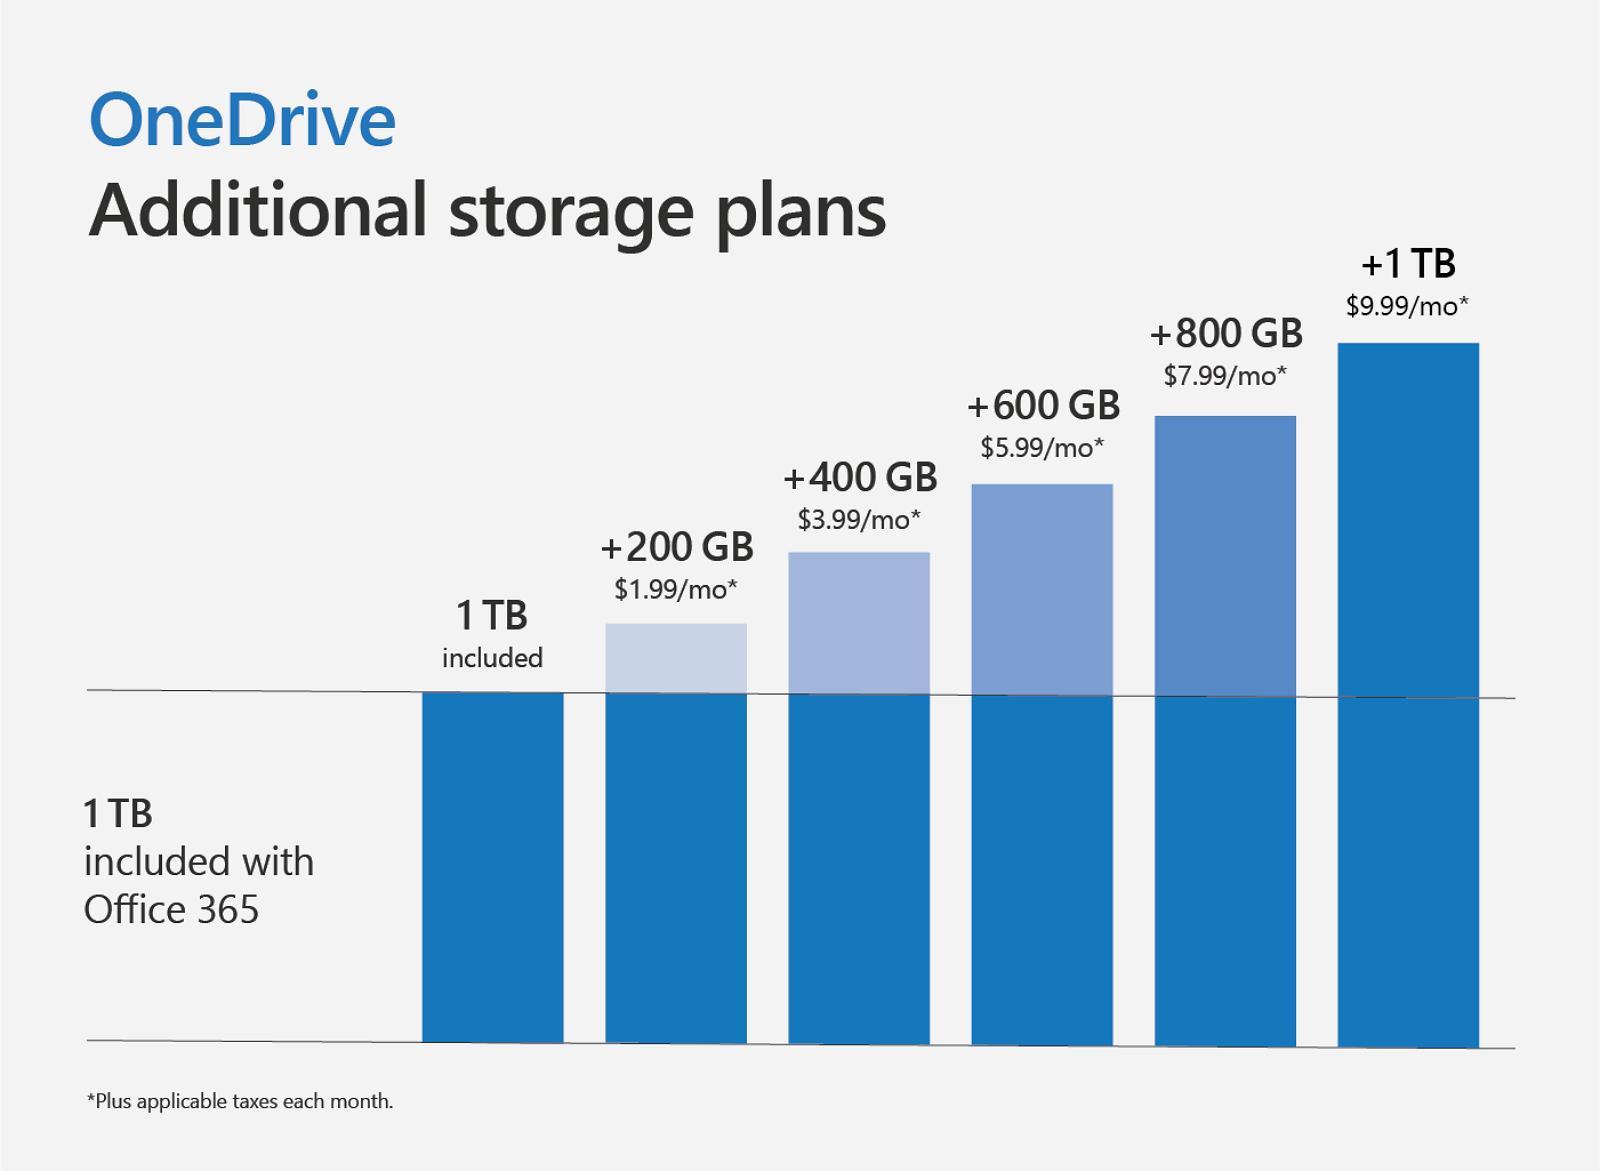 OneDrive 2TB storage plan